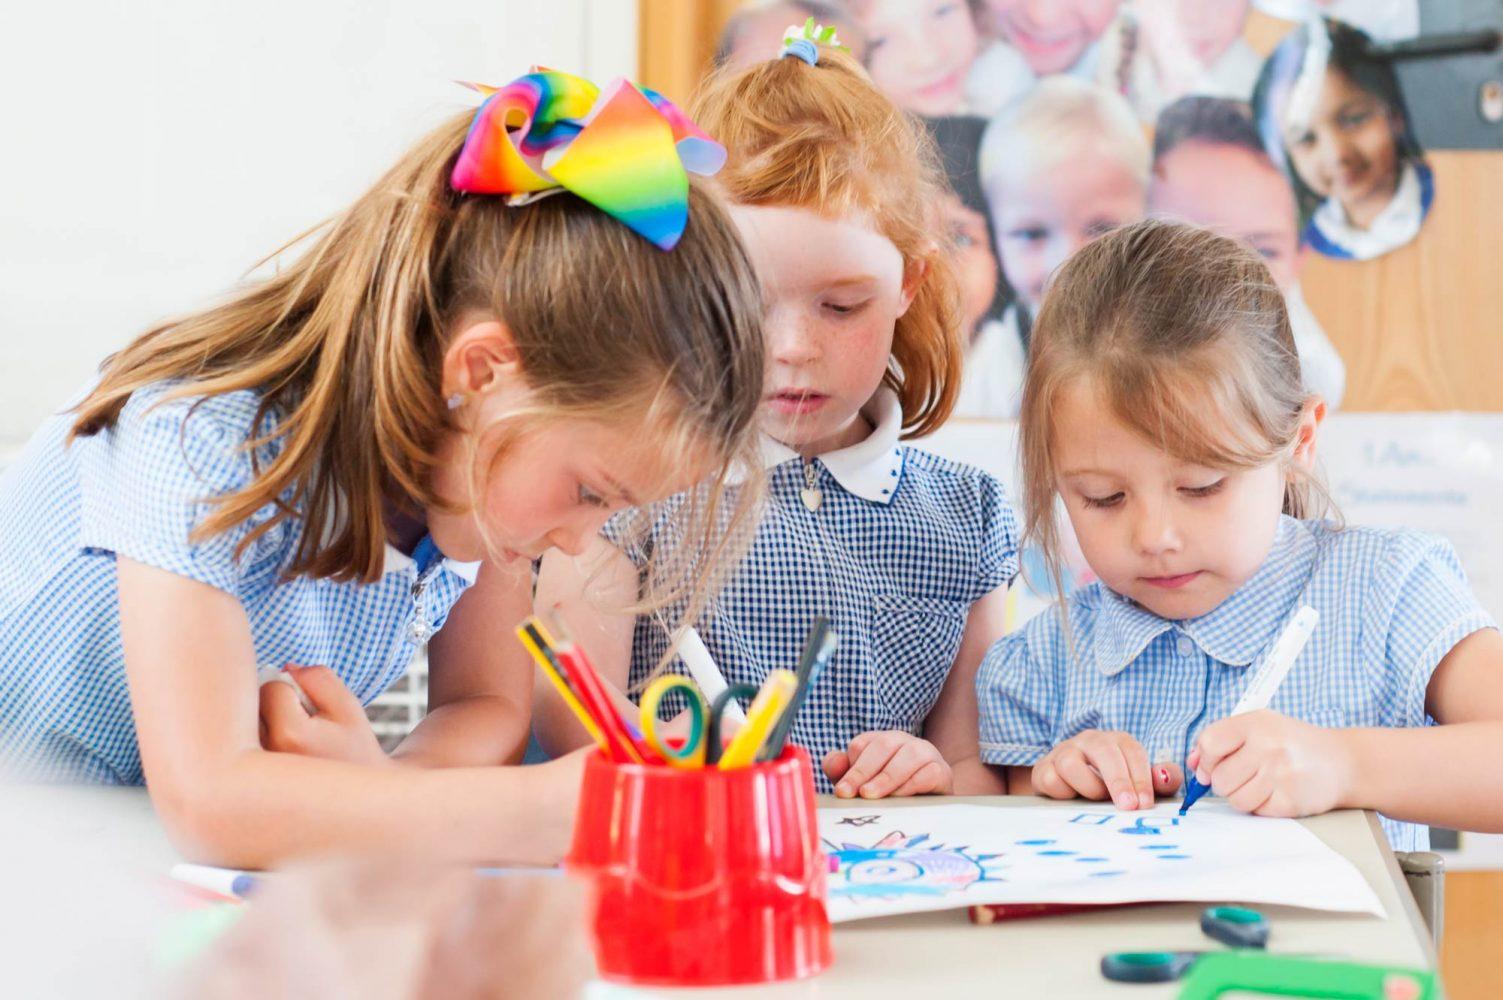 South London school photography of pupils at Beddington Infants school